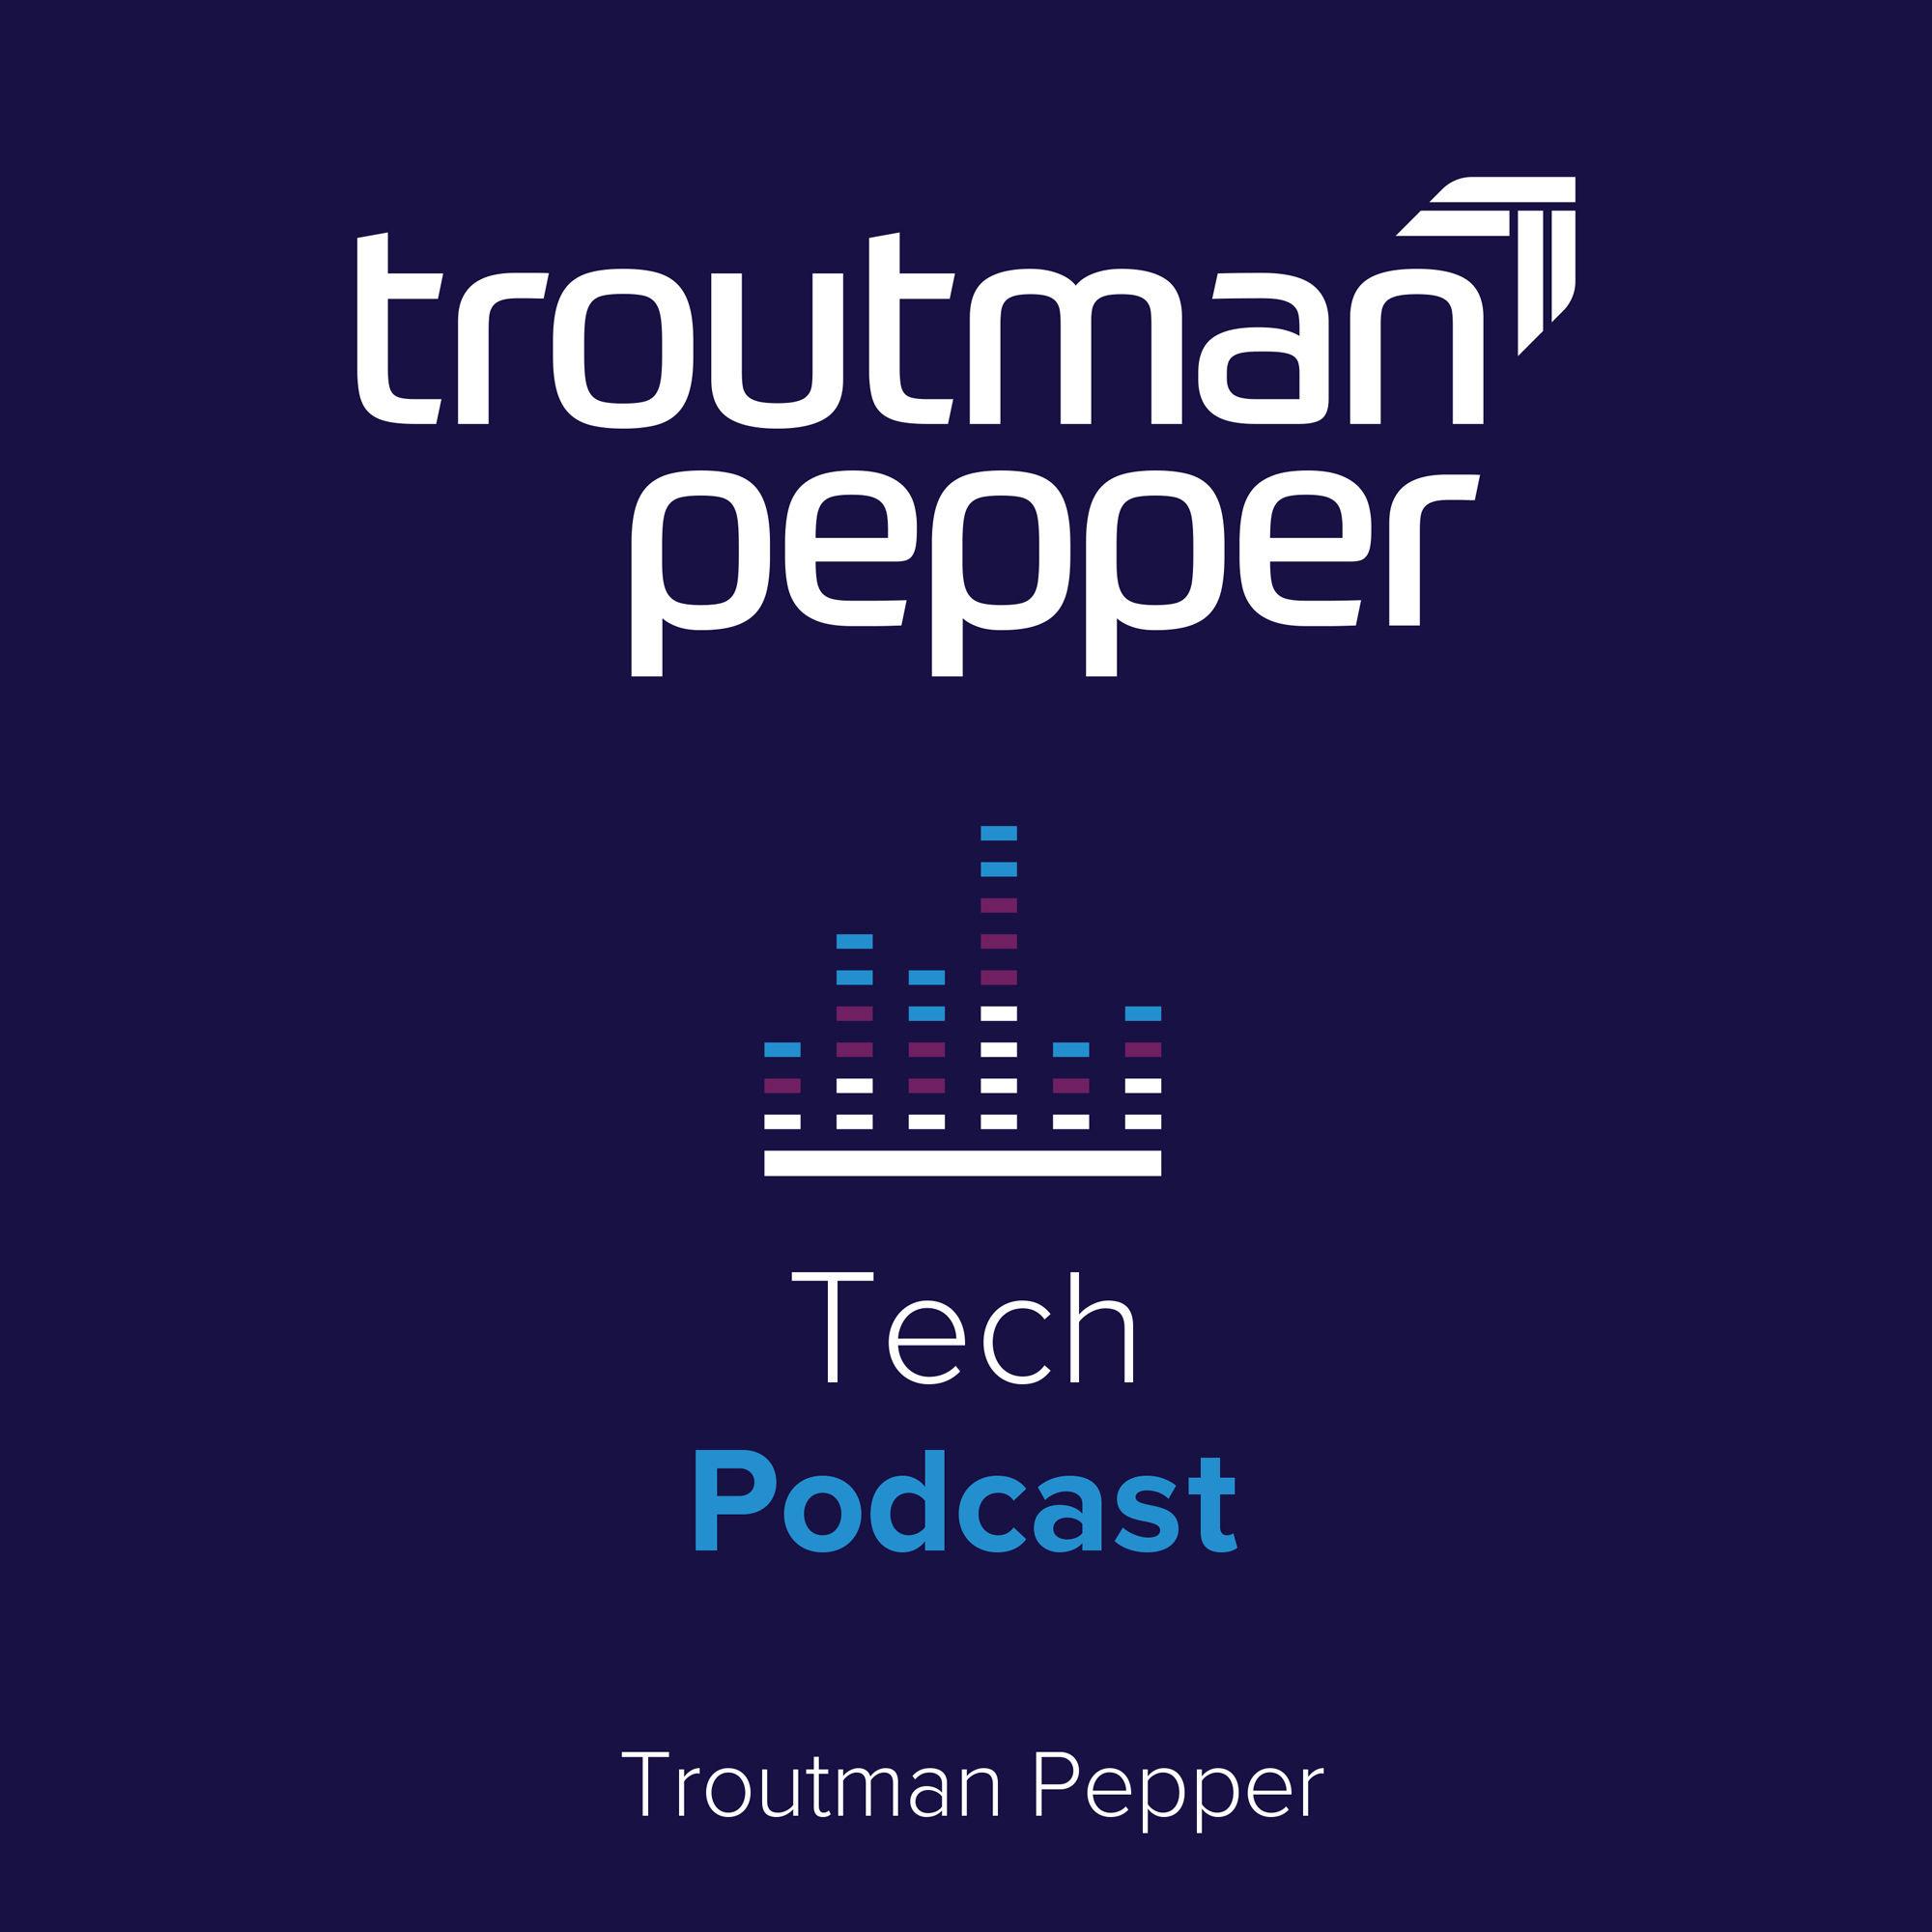 Tech Podcast